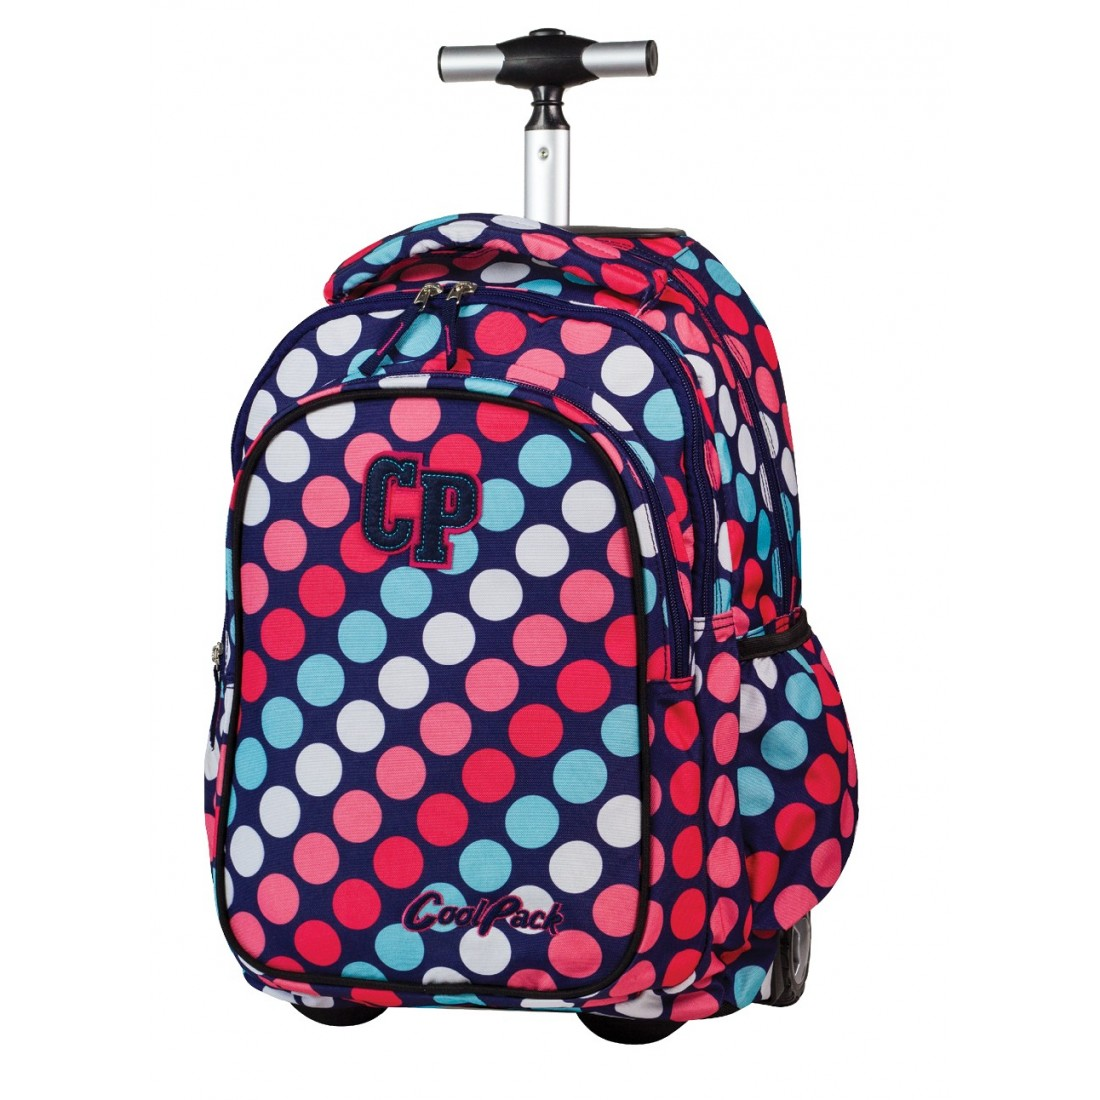 Plecak CoolPack na kółkach w Kropki